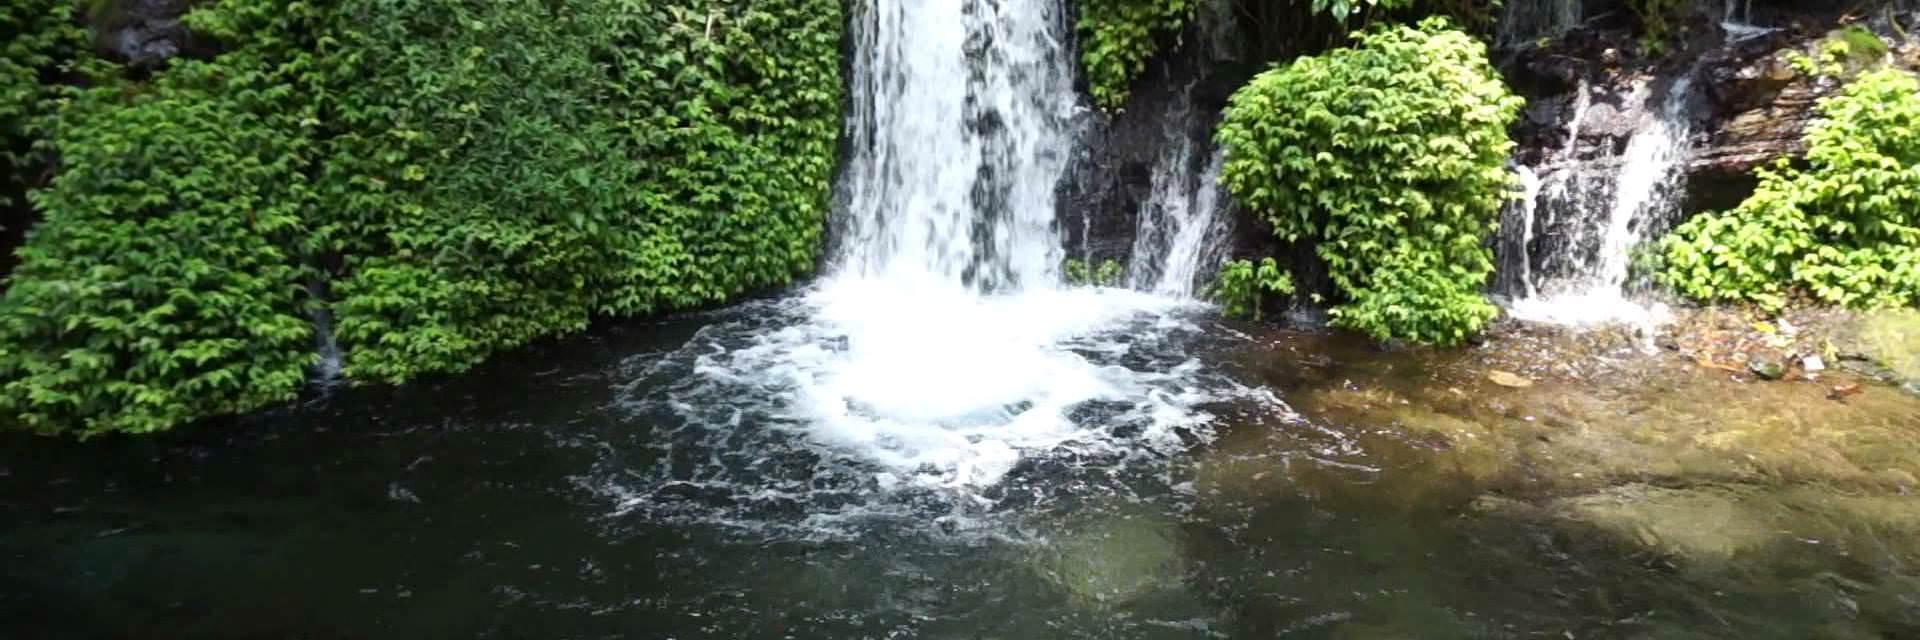 6 Wisata Sumber Air Terhits Di Malang Yang Akan Membuat Kamu Menjadi